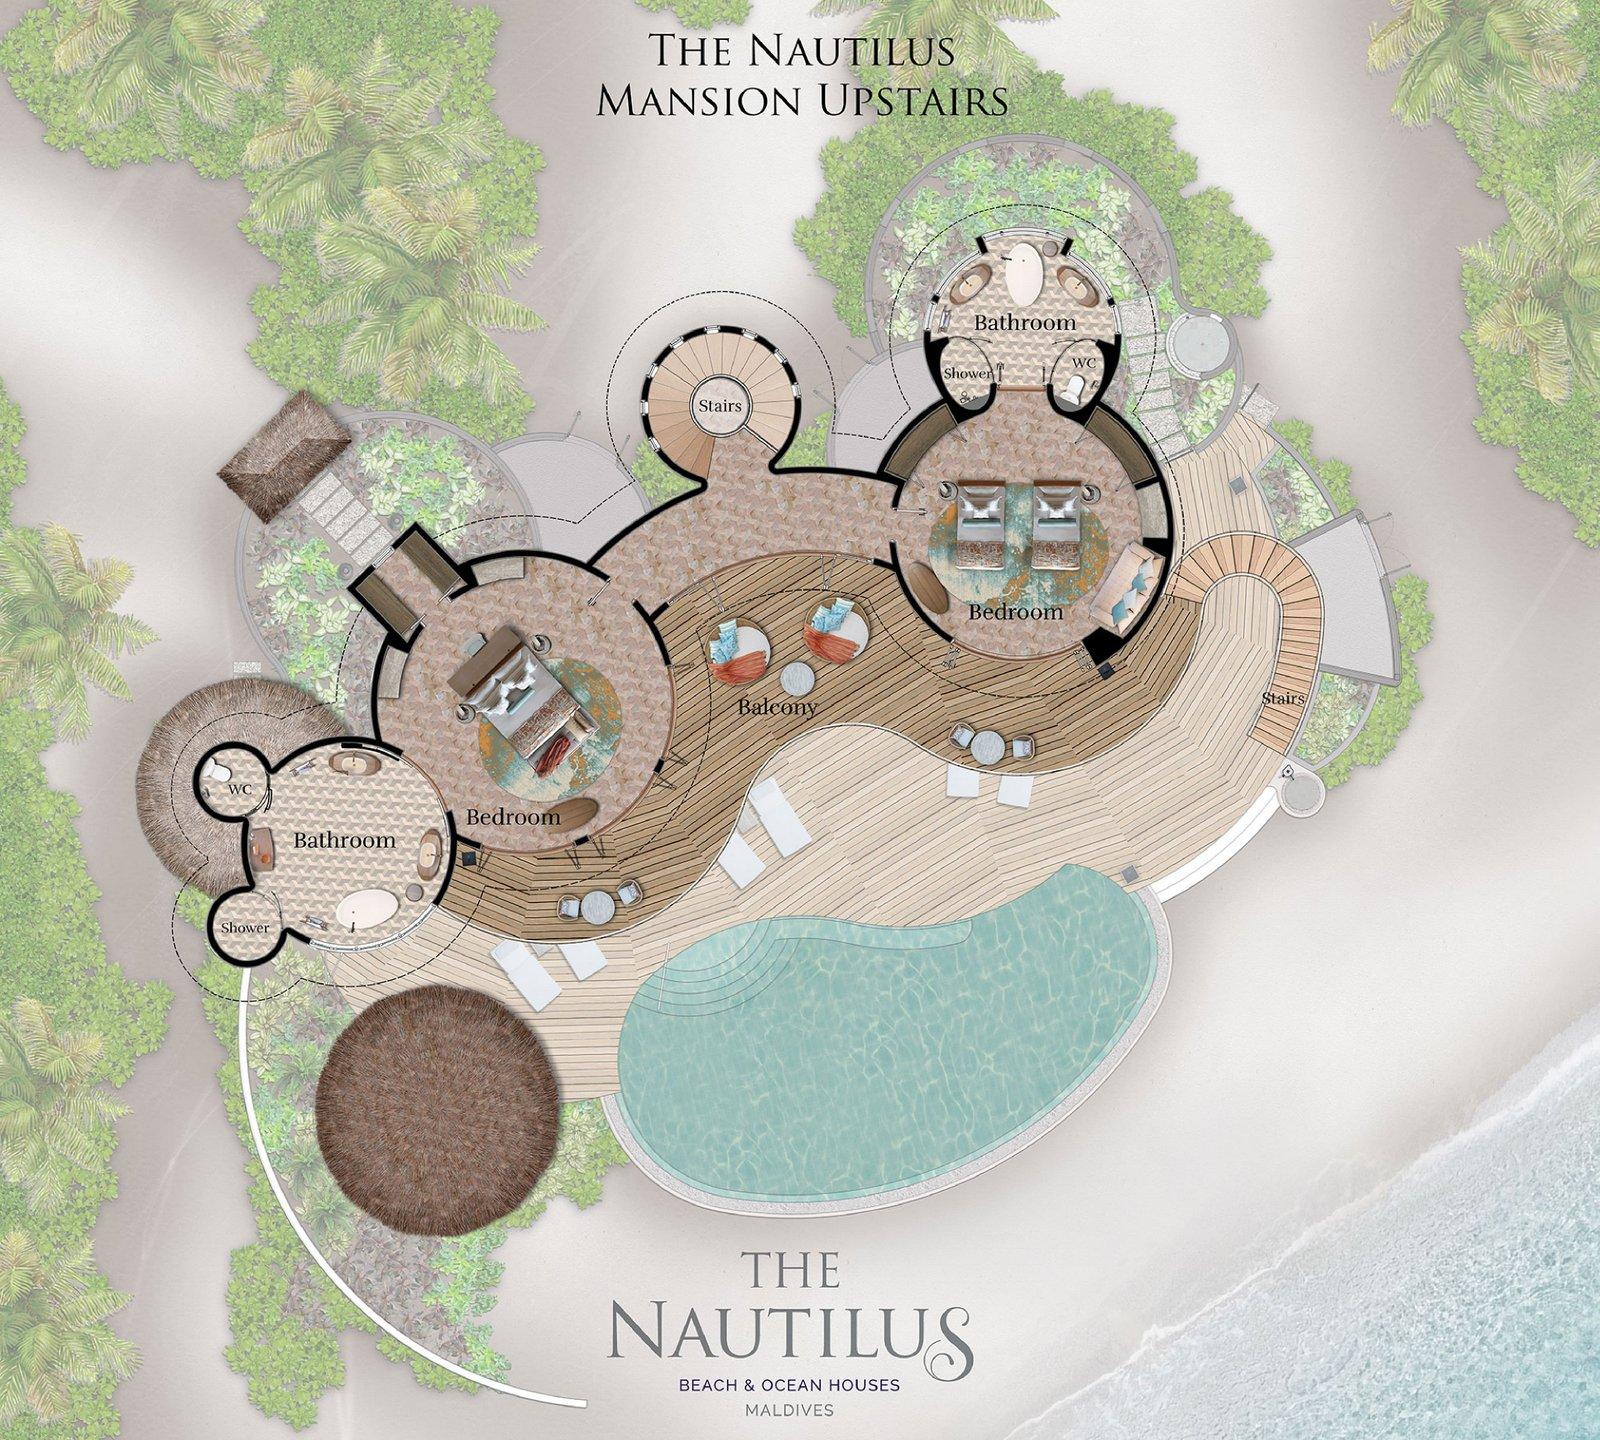 Мальдивы, отель The Nautilus Maldives, план-схема номера Three-Bedroom The Nautilus Mansion